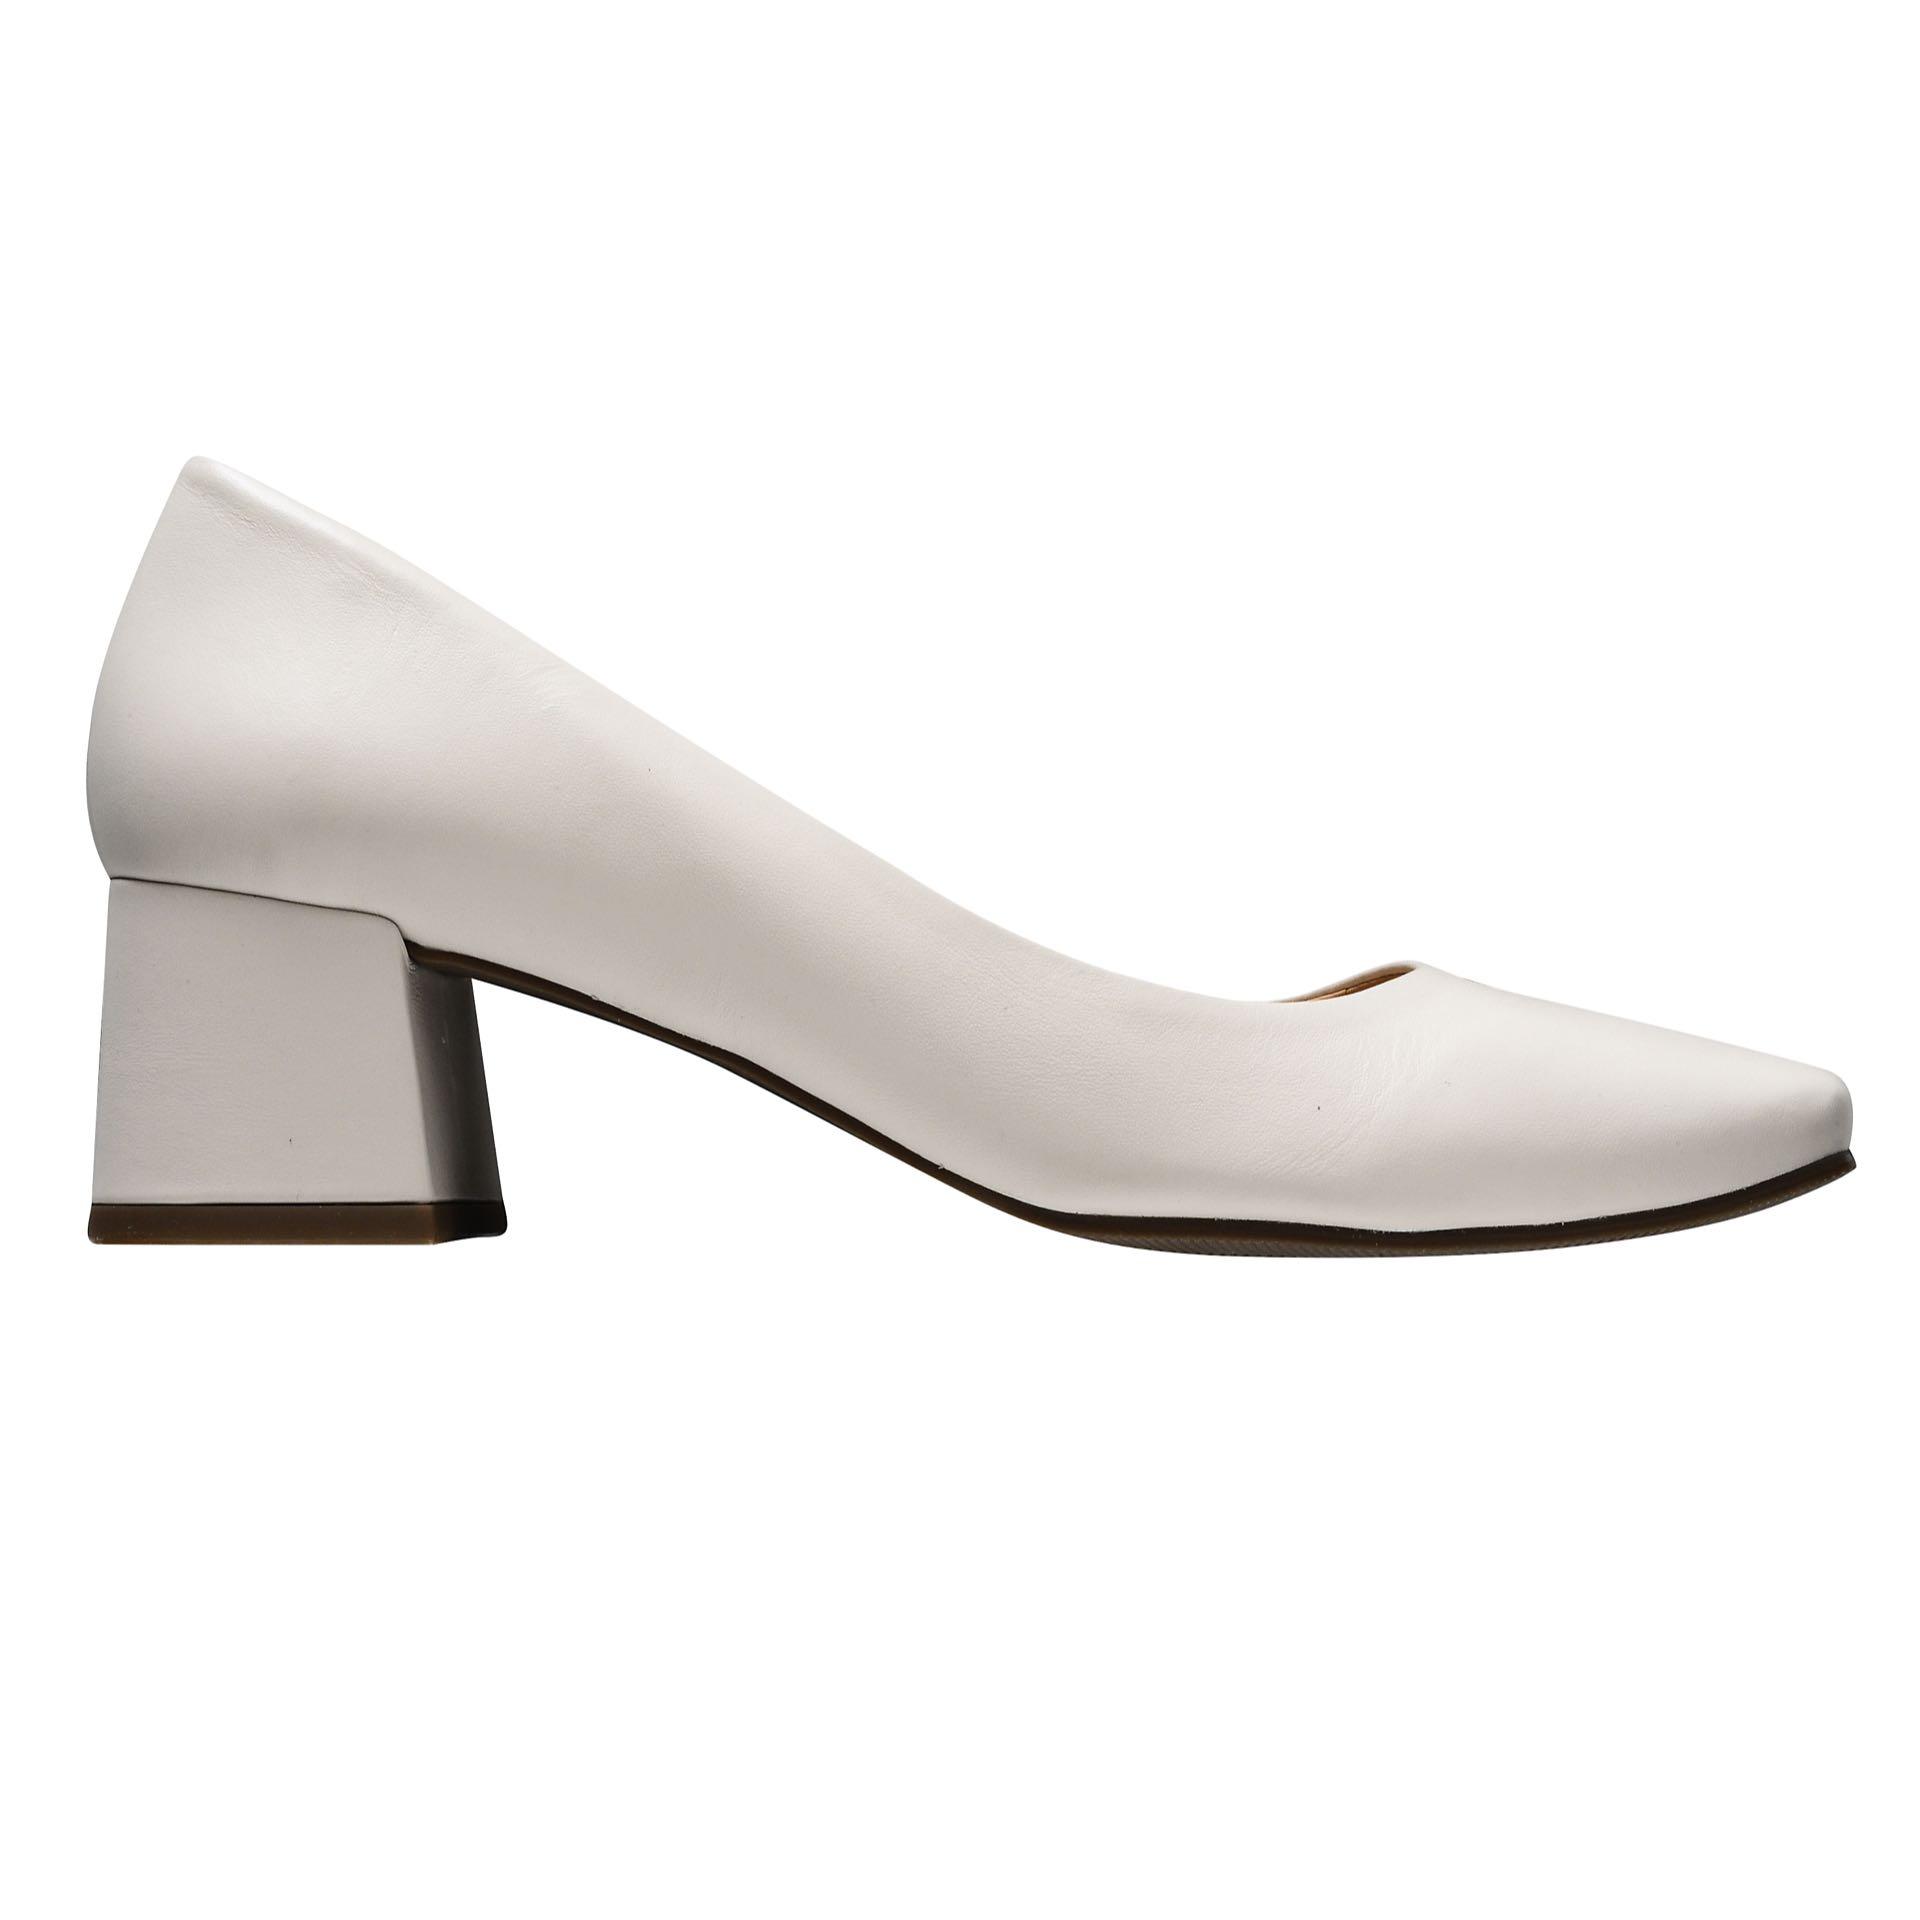 #PARA TI - LOOK SHORTS - Moda - Zapatos Sara B - 20171229